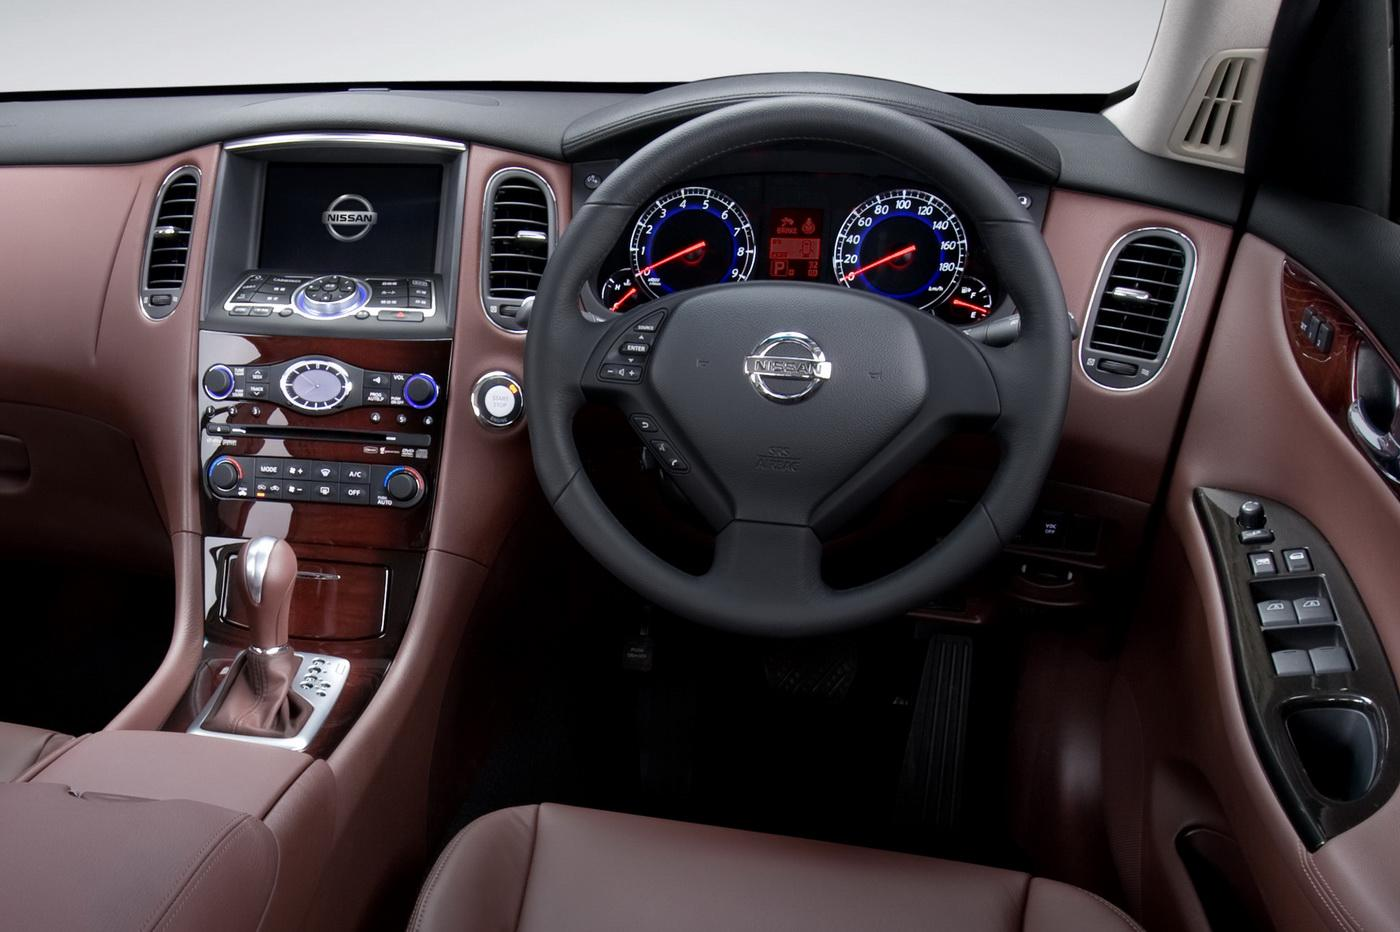 1990 Nissan Skyline - Interior Pictures - CarGurus 26